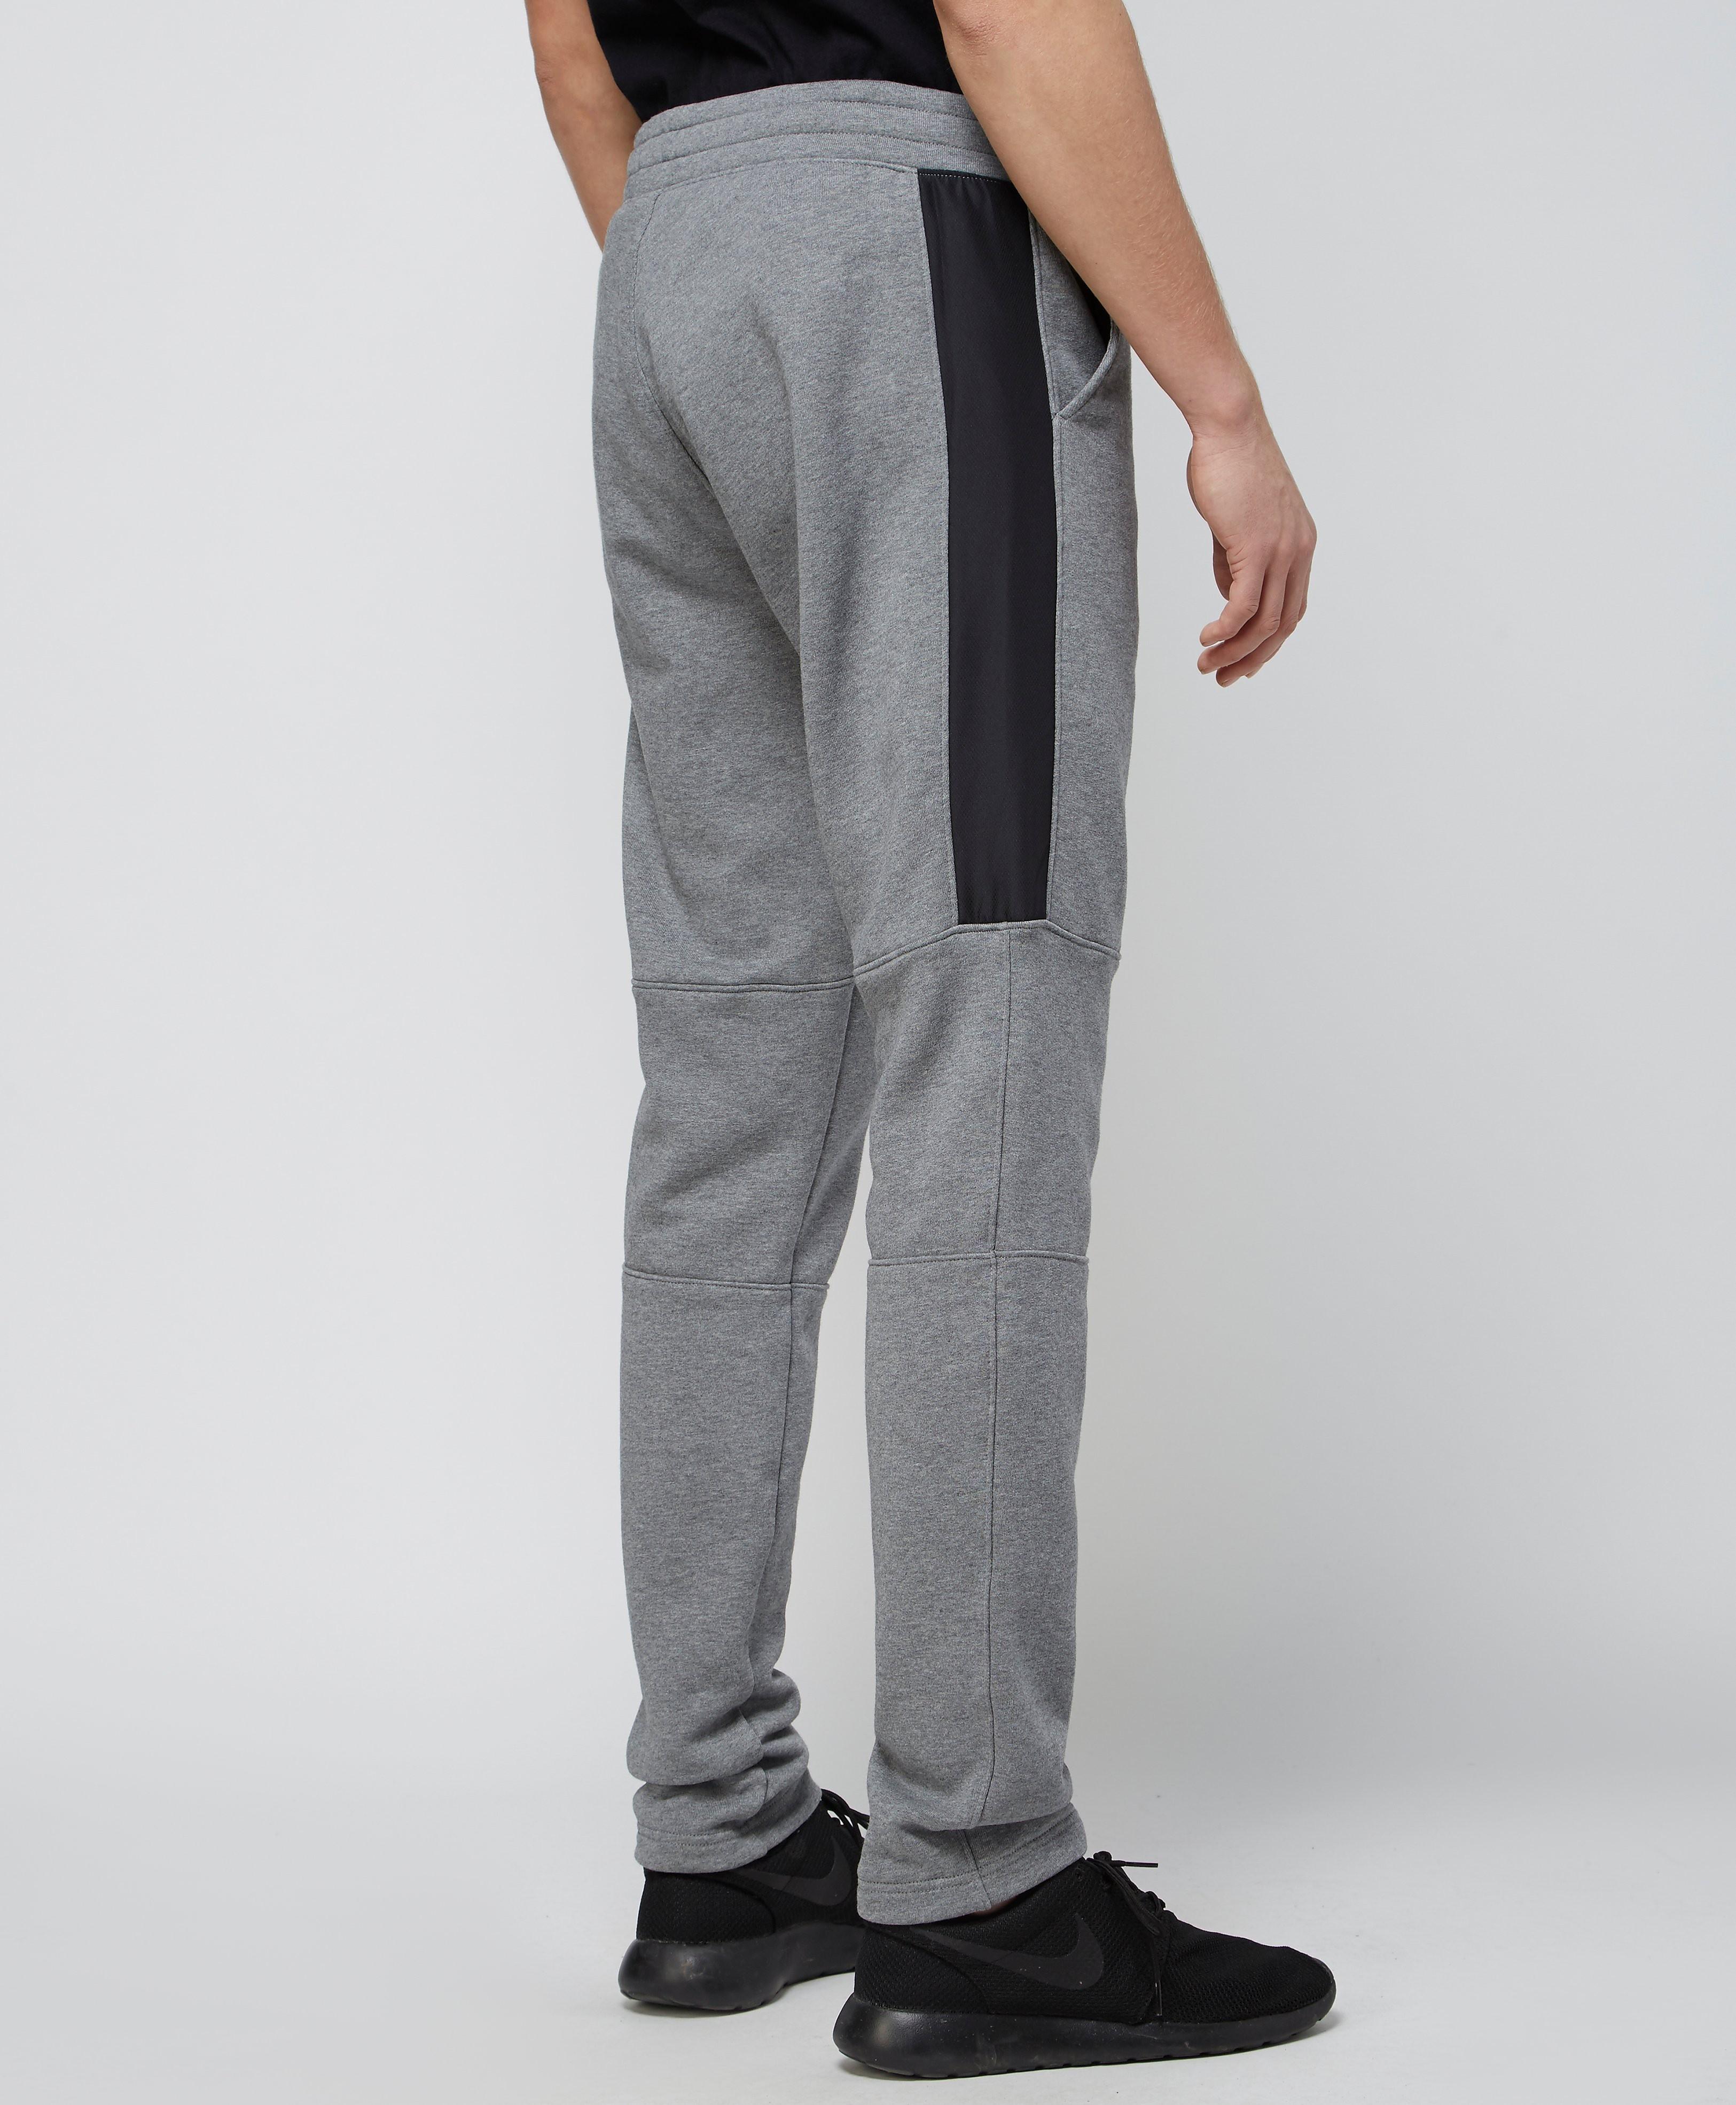 Emporio Armani EA7 Slim Oh Track Pants